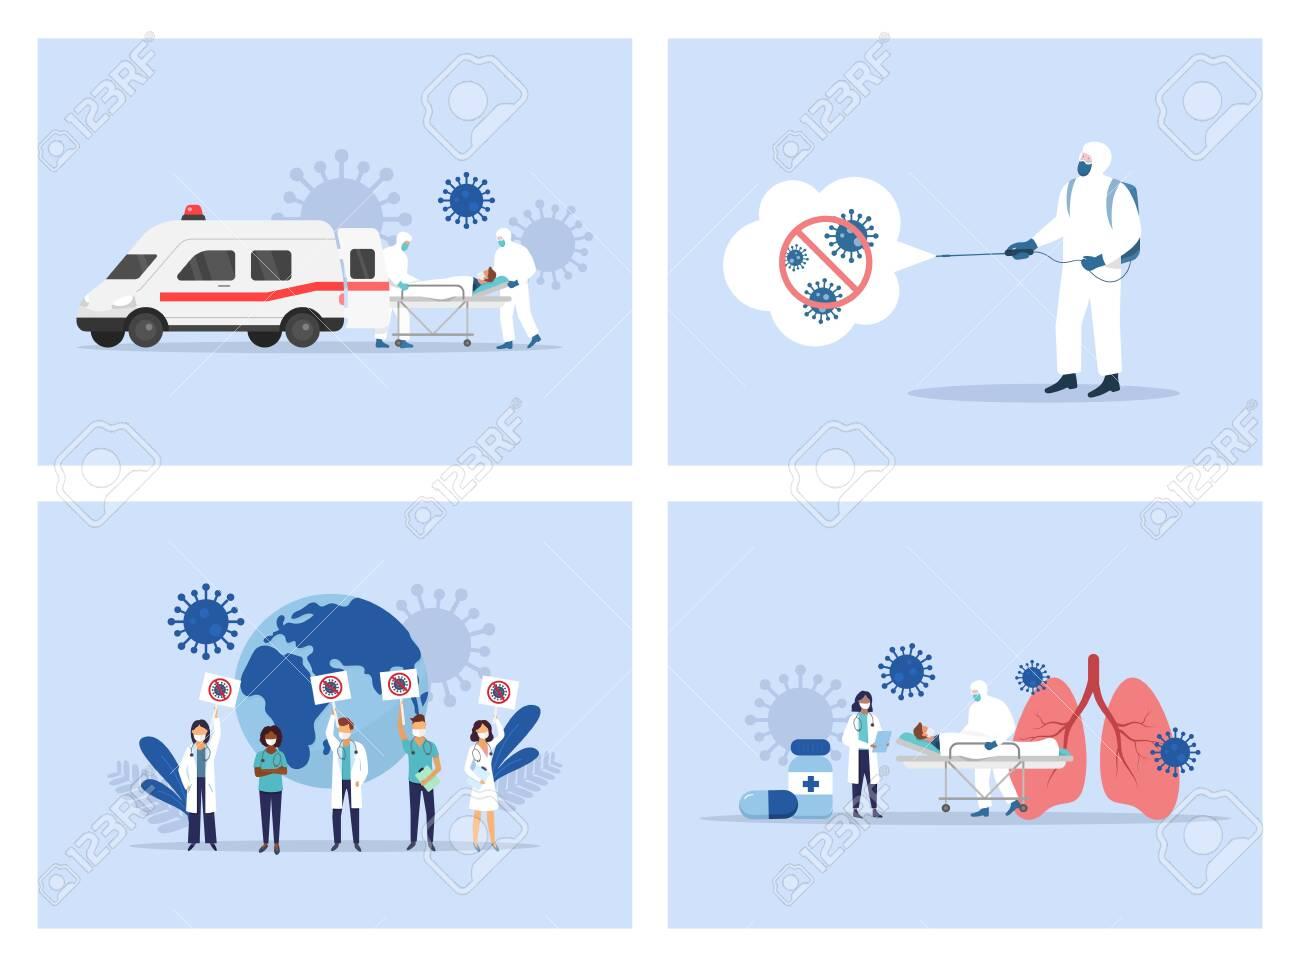 Coronavirus. Medical staff. Ambulance. Doctors and nusres Vector illustration - 148299117